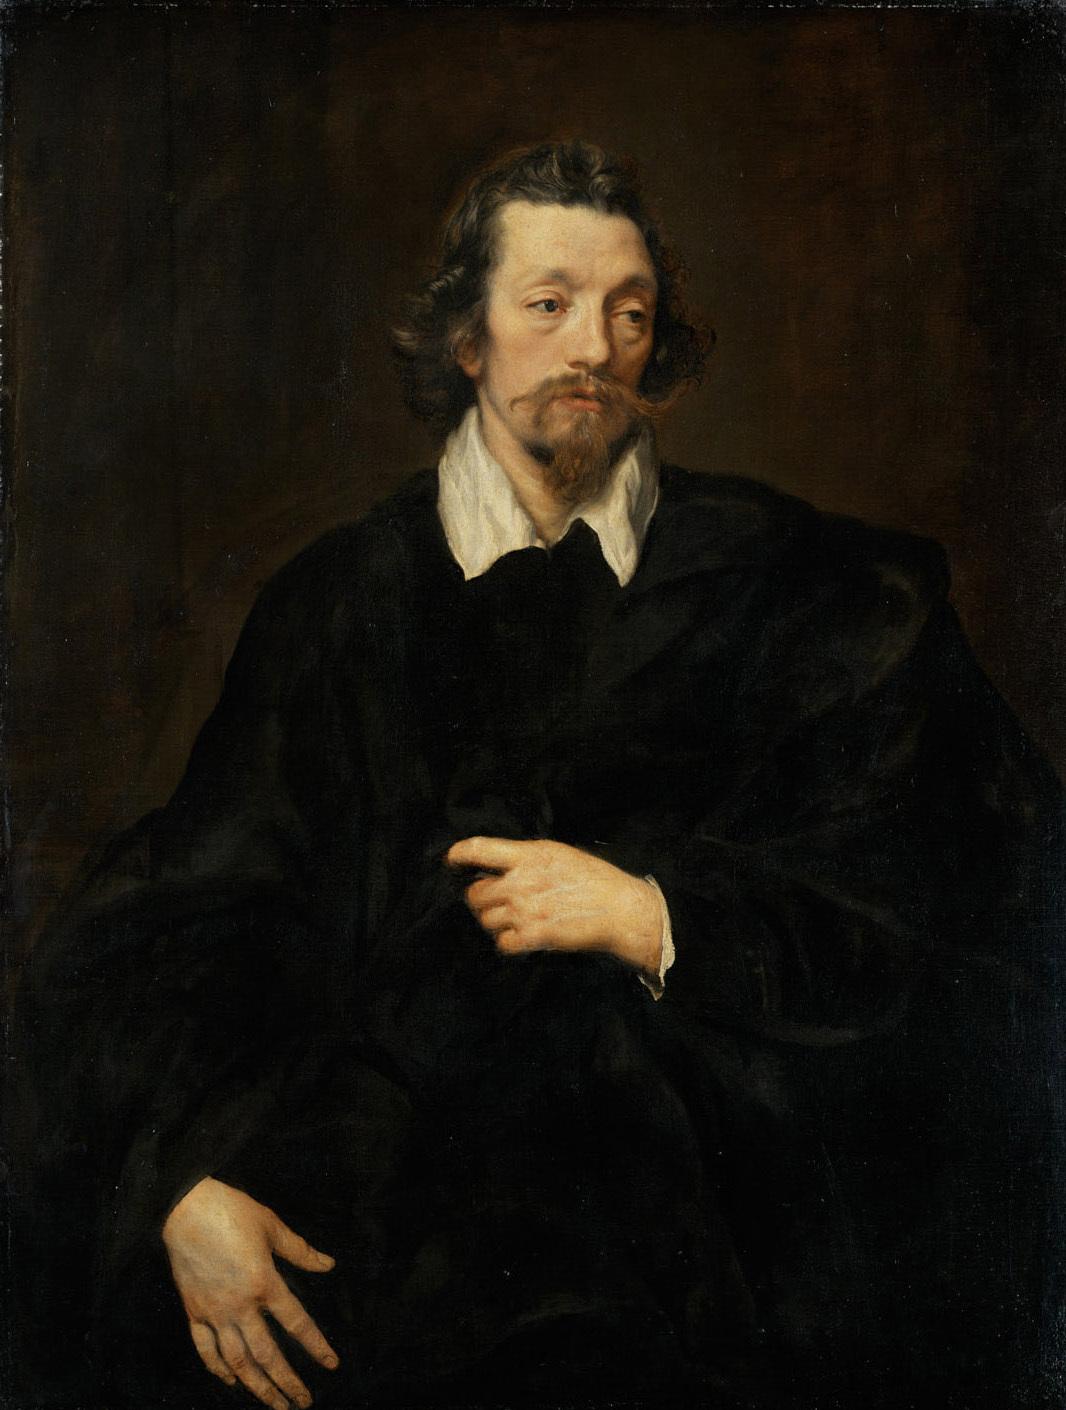 Jacomo de Cachiopin (1591/92-1659) von Anthonis van Dyck